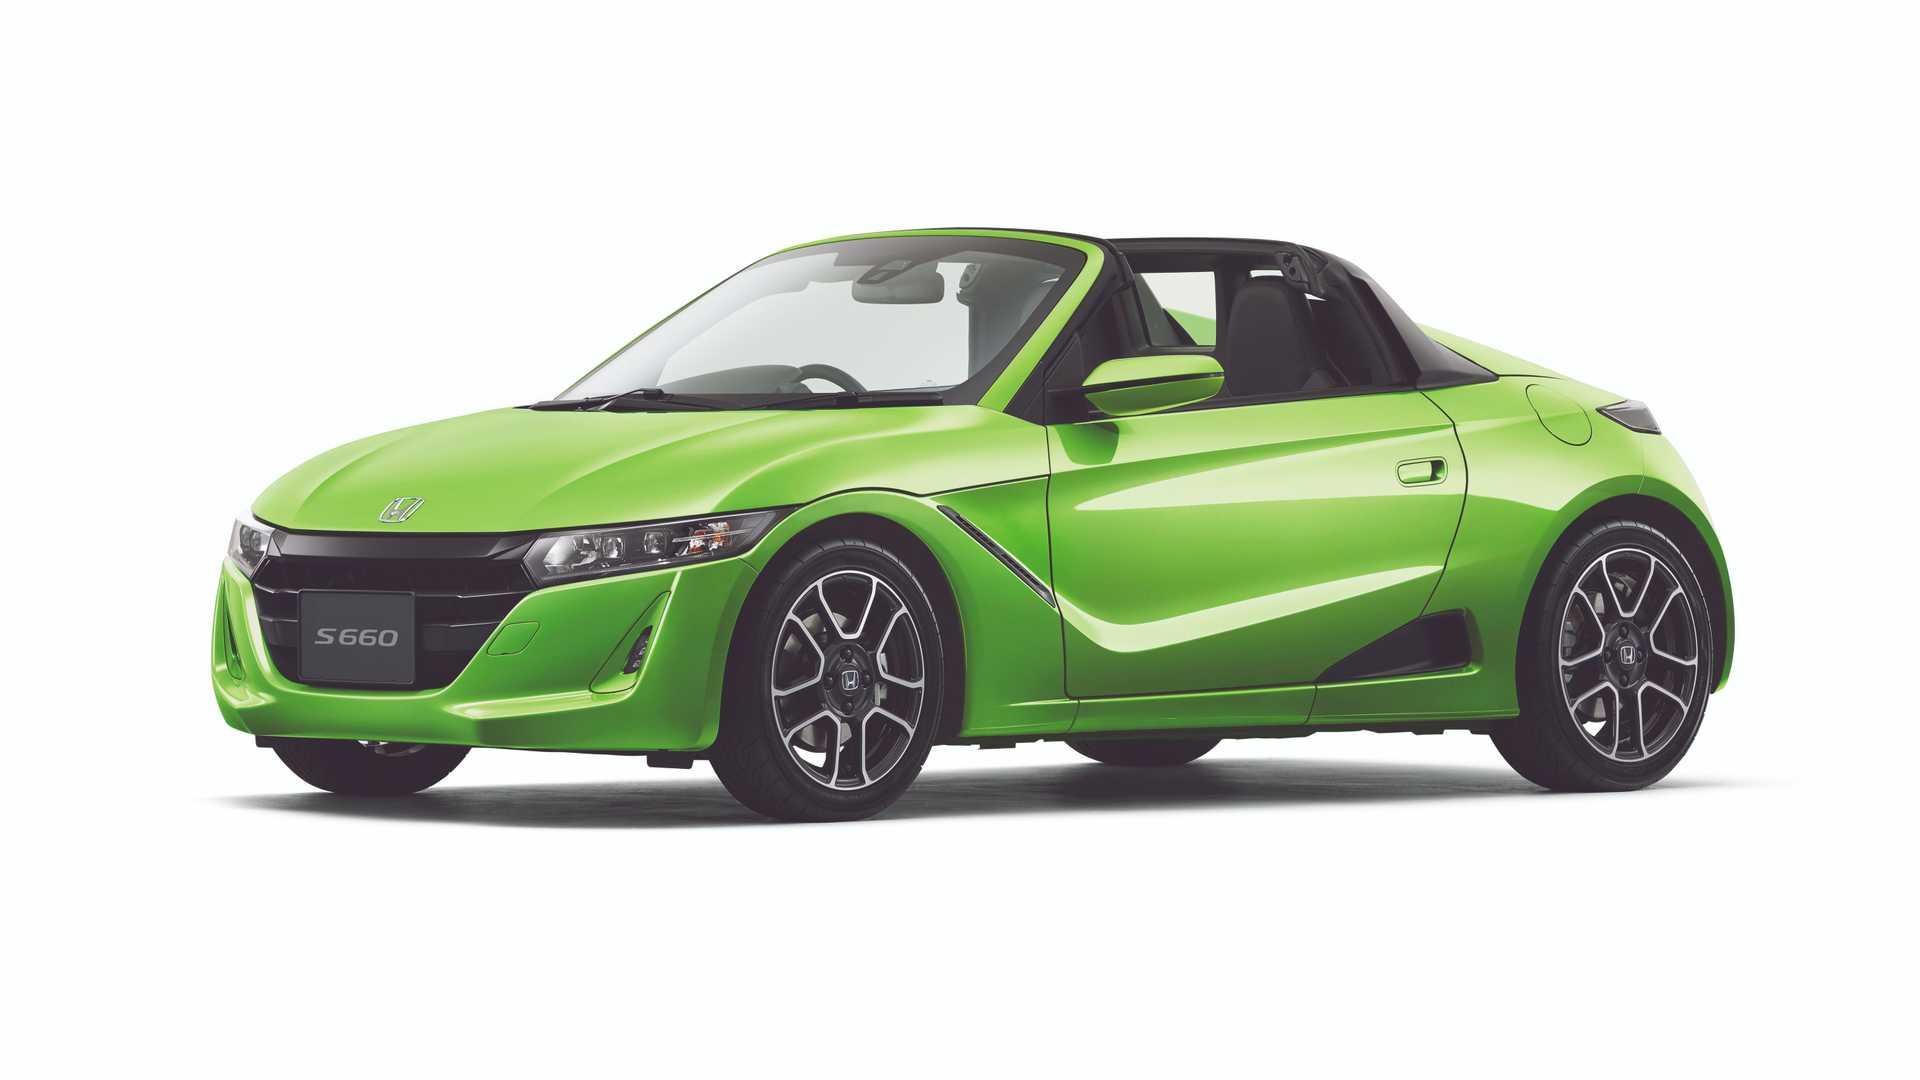 Honda S660 to oryginalny kei-car kabriolet